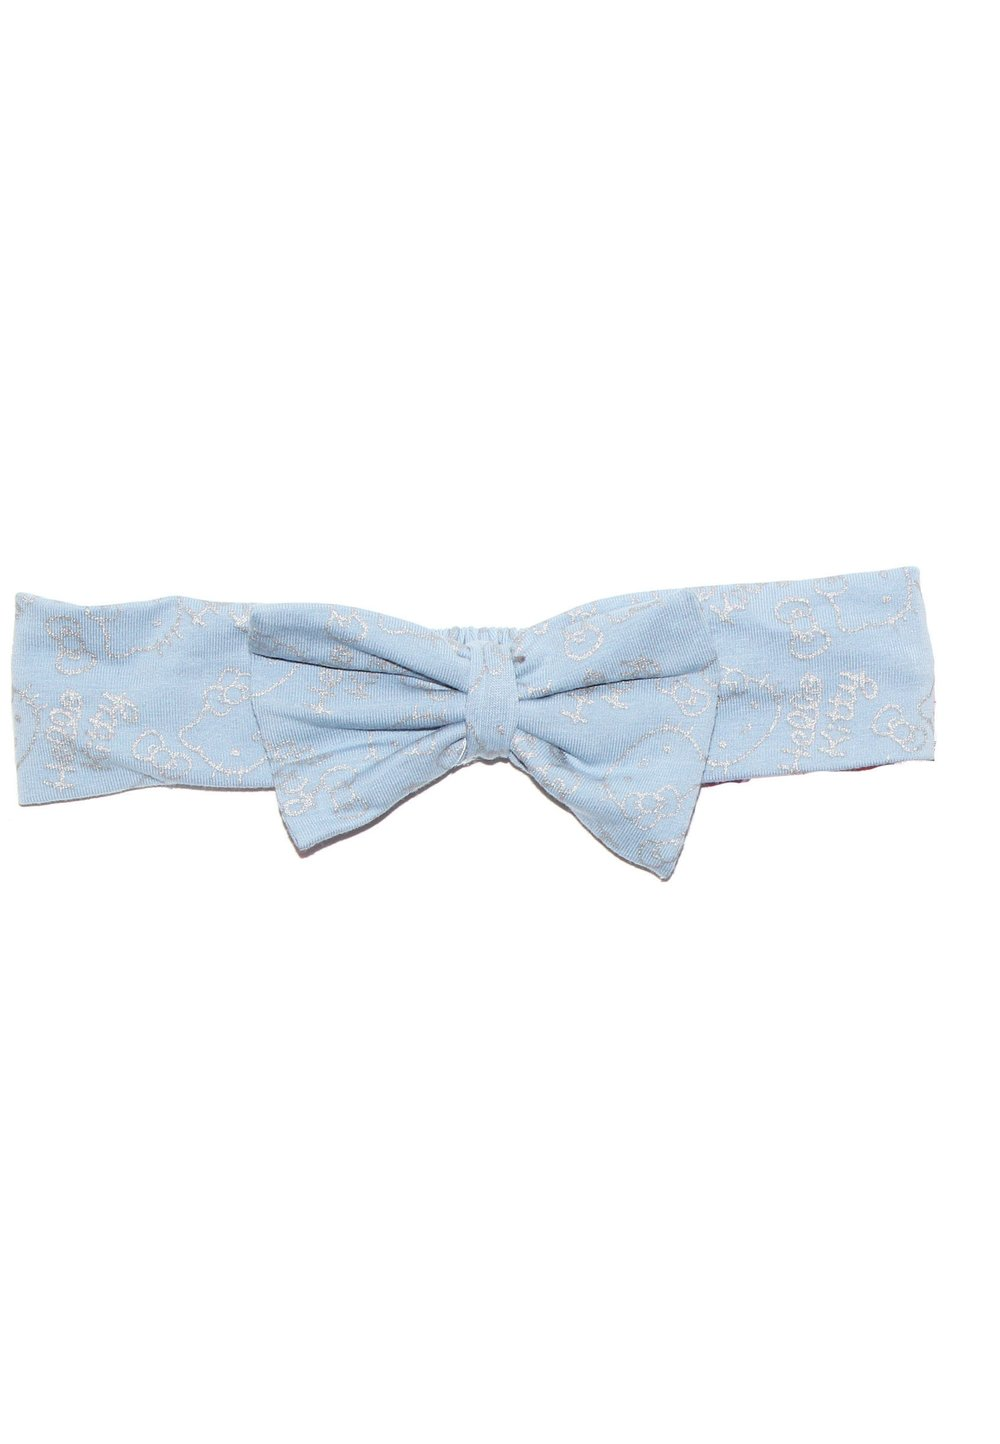 Bentita HK albastra, cu fundita imagine